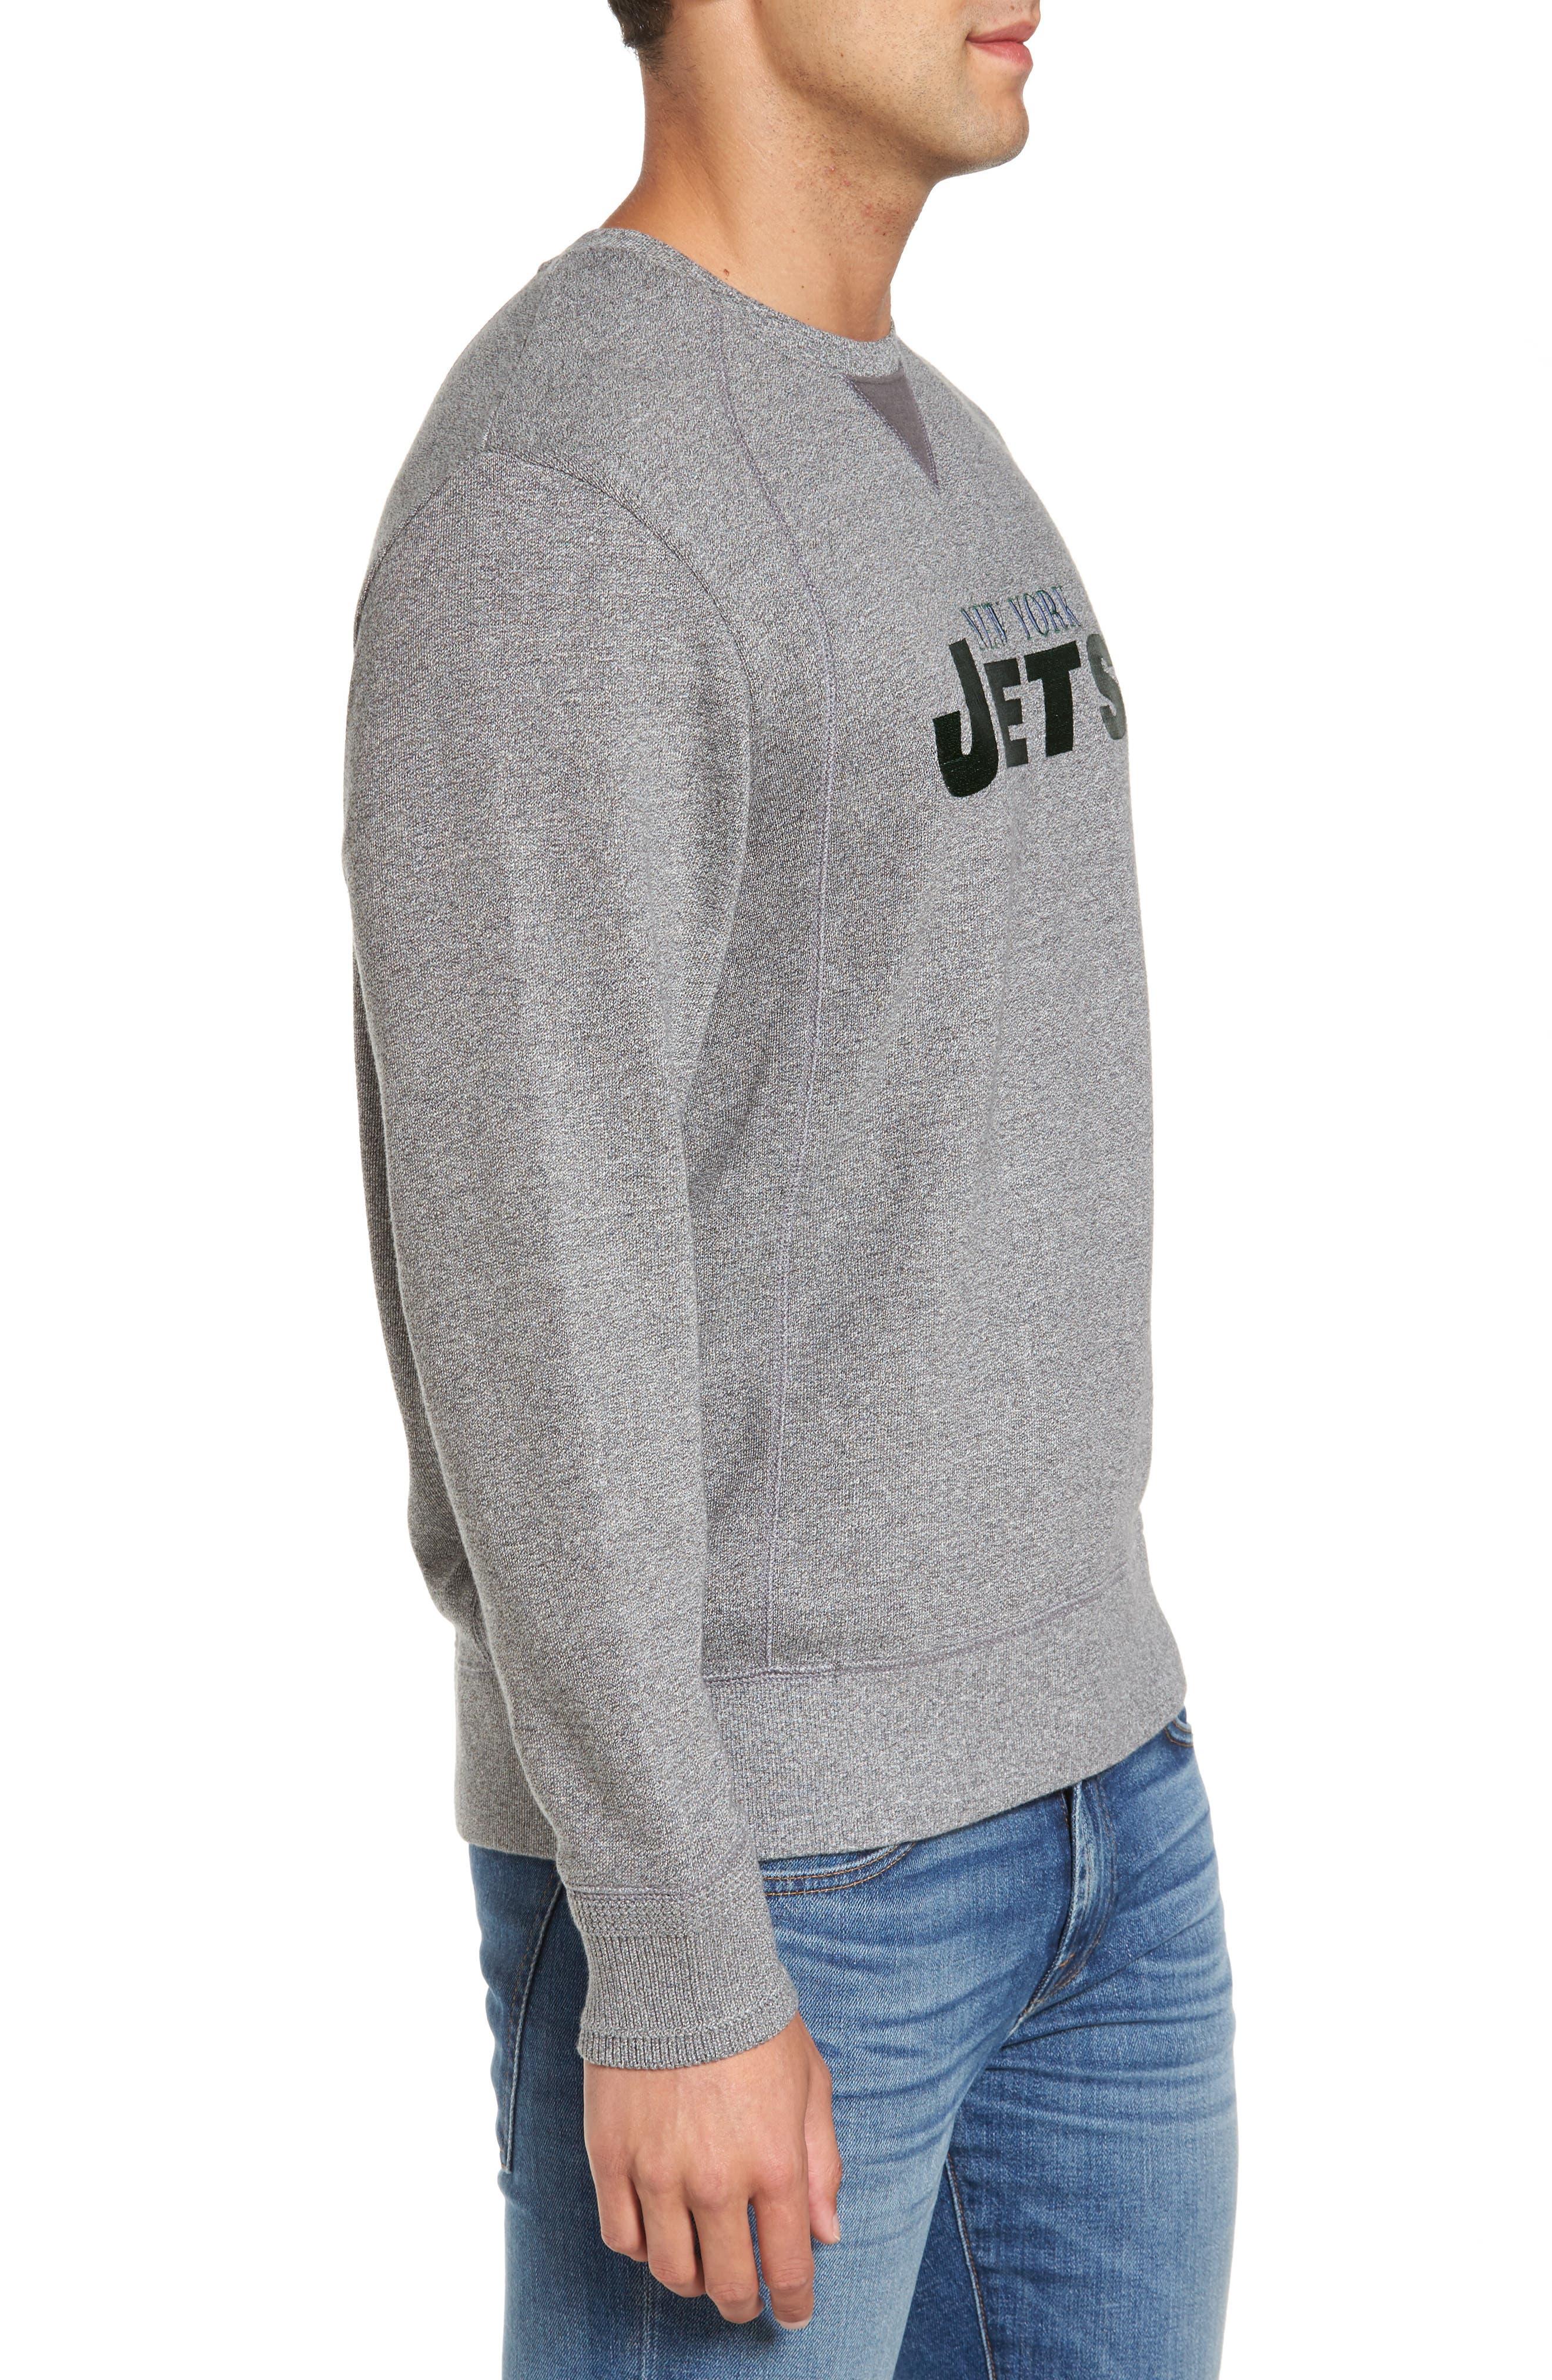 NFL Stitch of Liberty Embroidered Crewneck Sweatshirt,                             Alternate thumbnail 79, color,